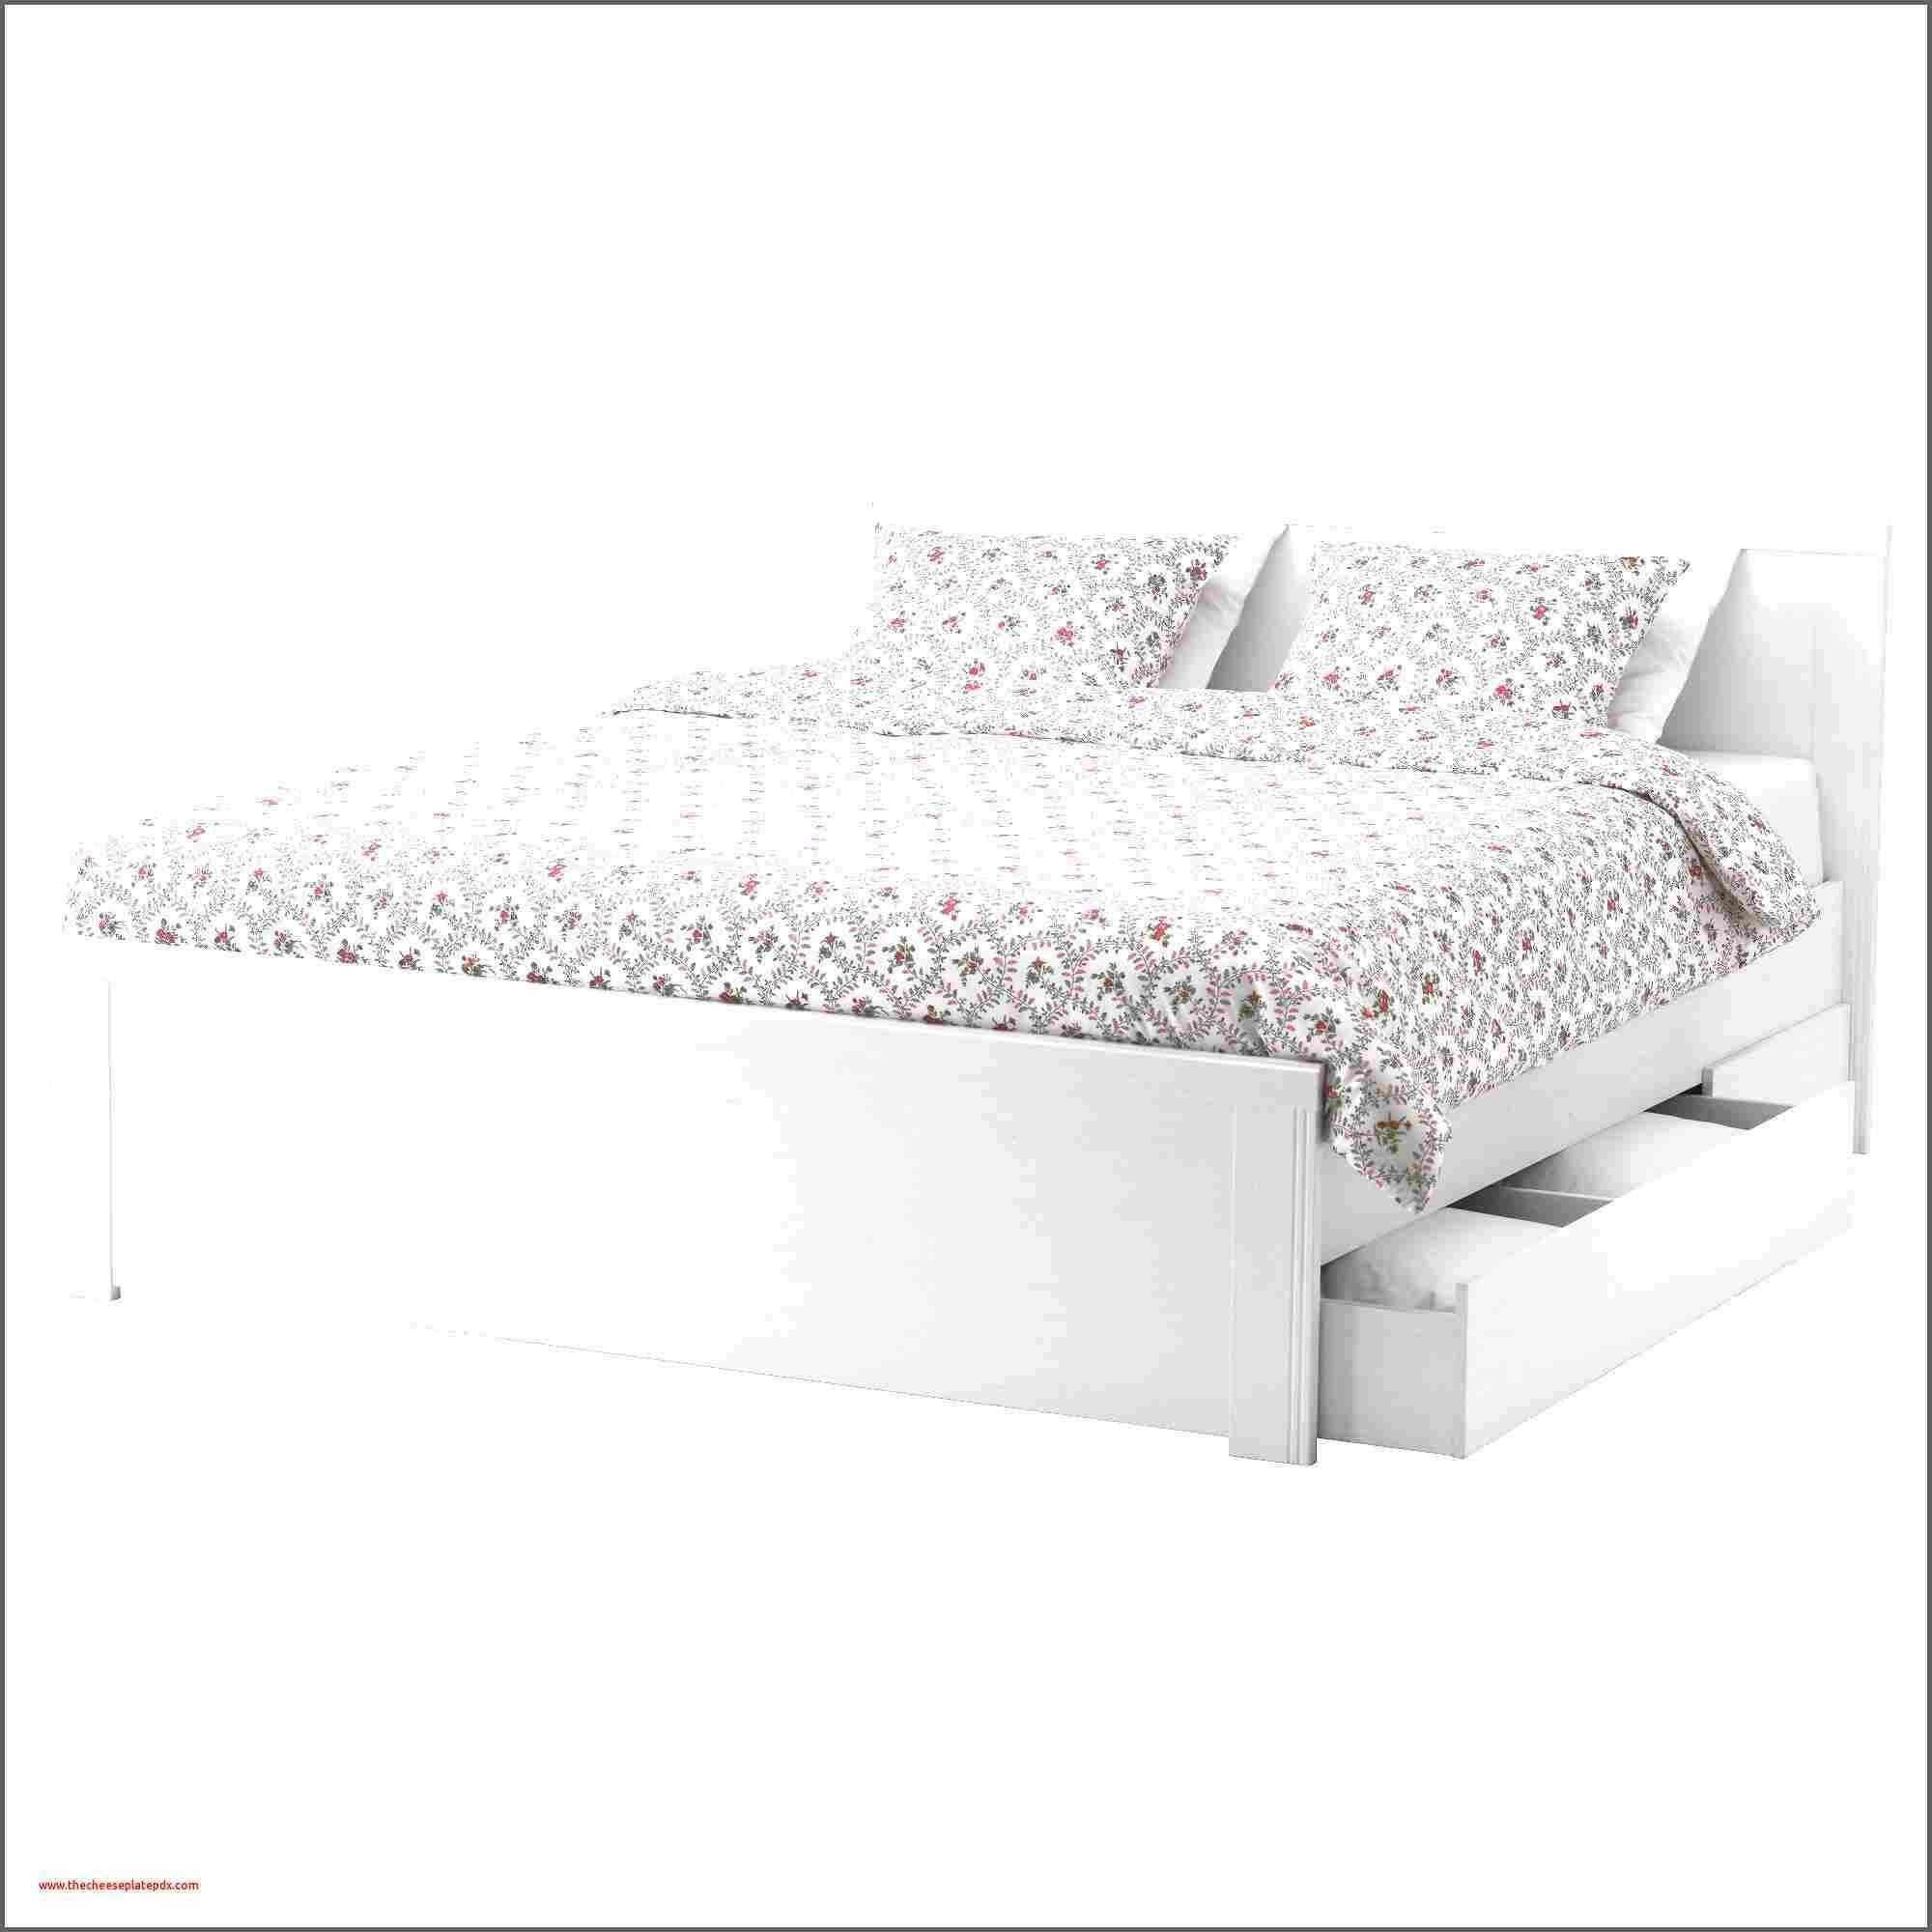 Structure De Lit 160×200 Meilleur De 23 160 Cm Bett Advanced Cadre De Lit Ikea Malm Ikea Lit Malm 160